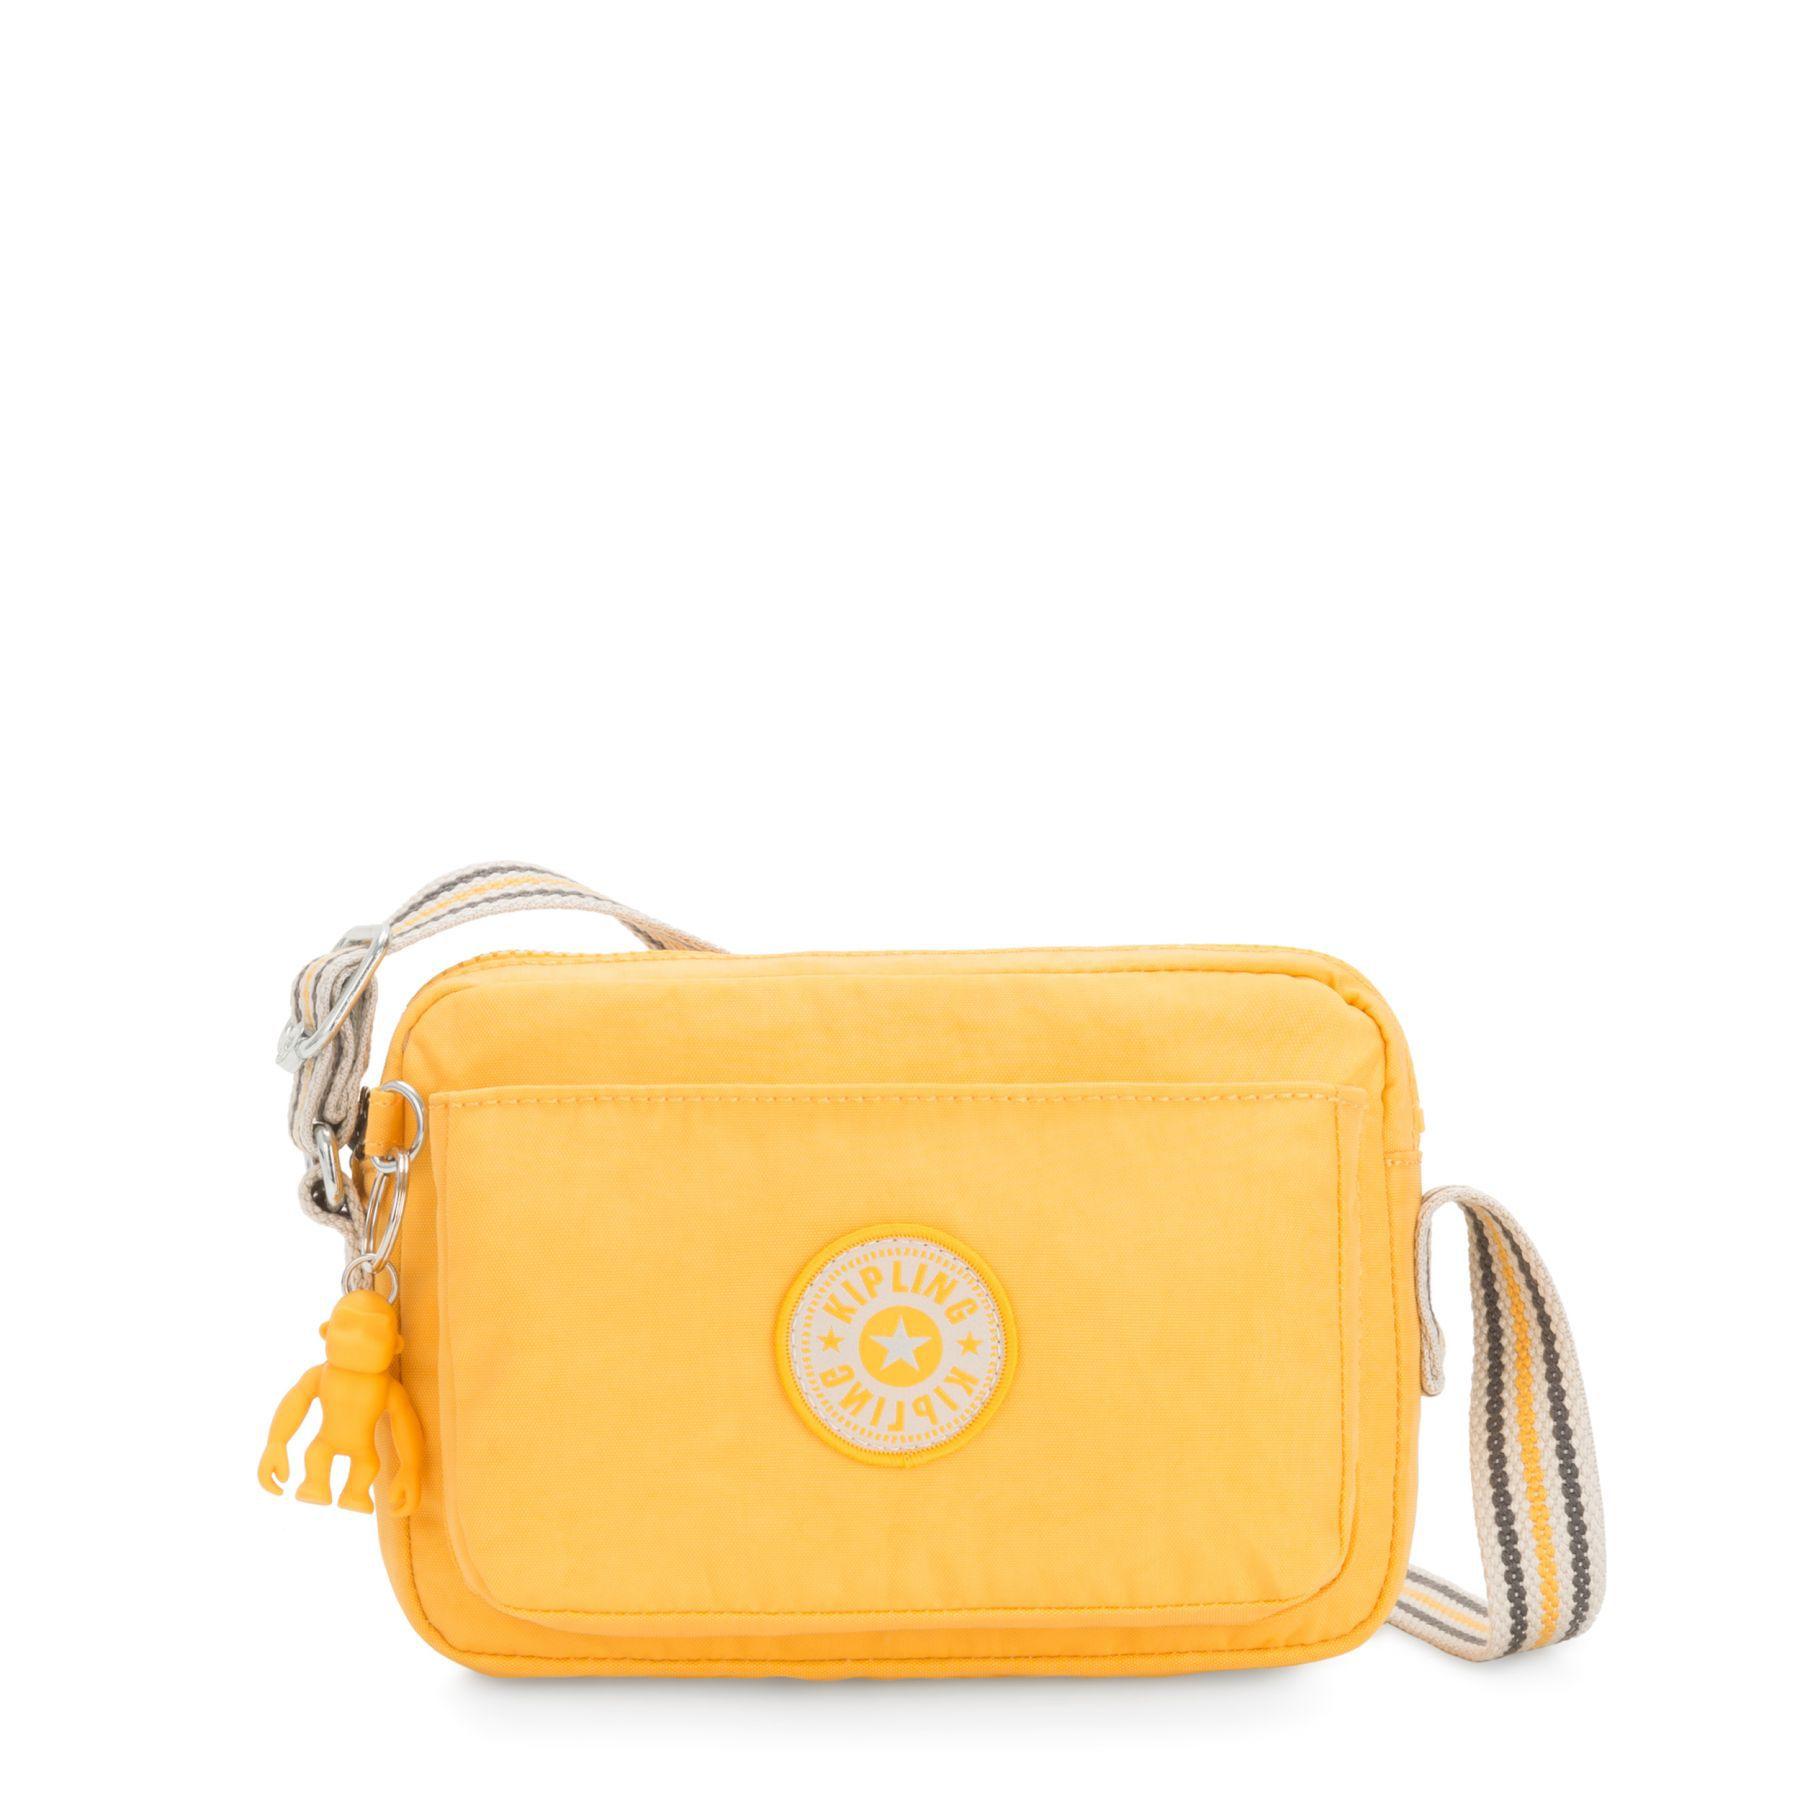 Bolsa Pequena Transversal Abanu Kipling Vivid Yellow